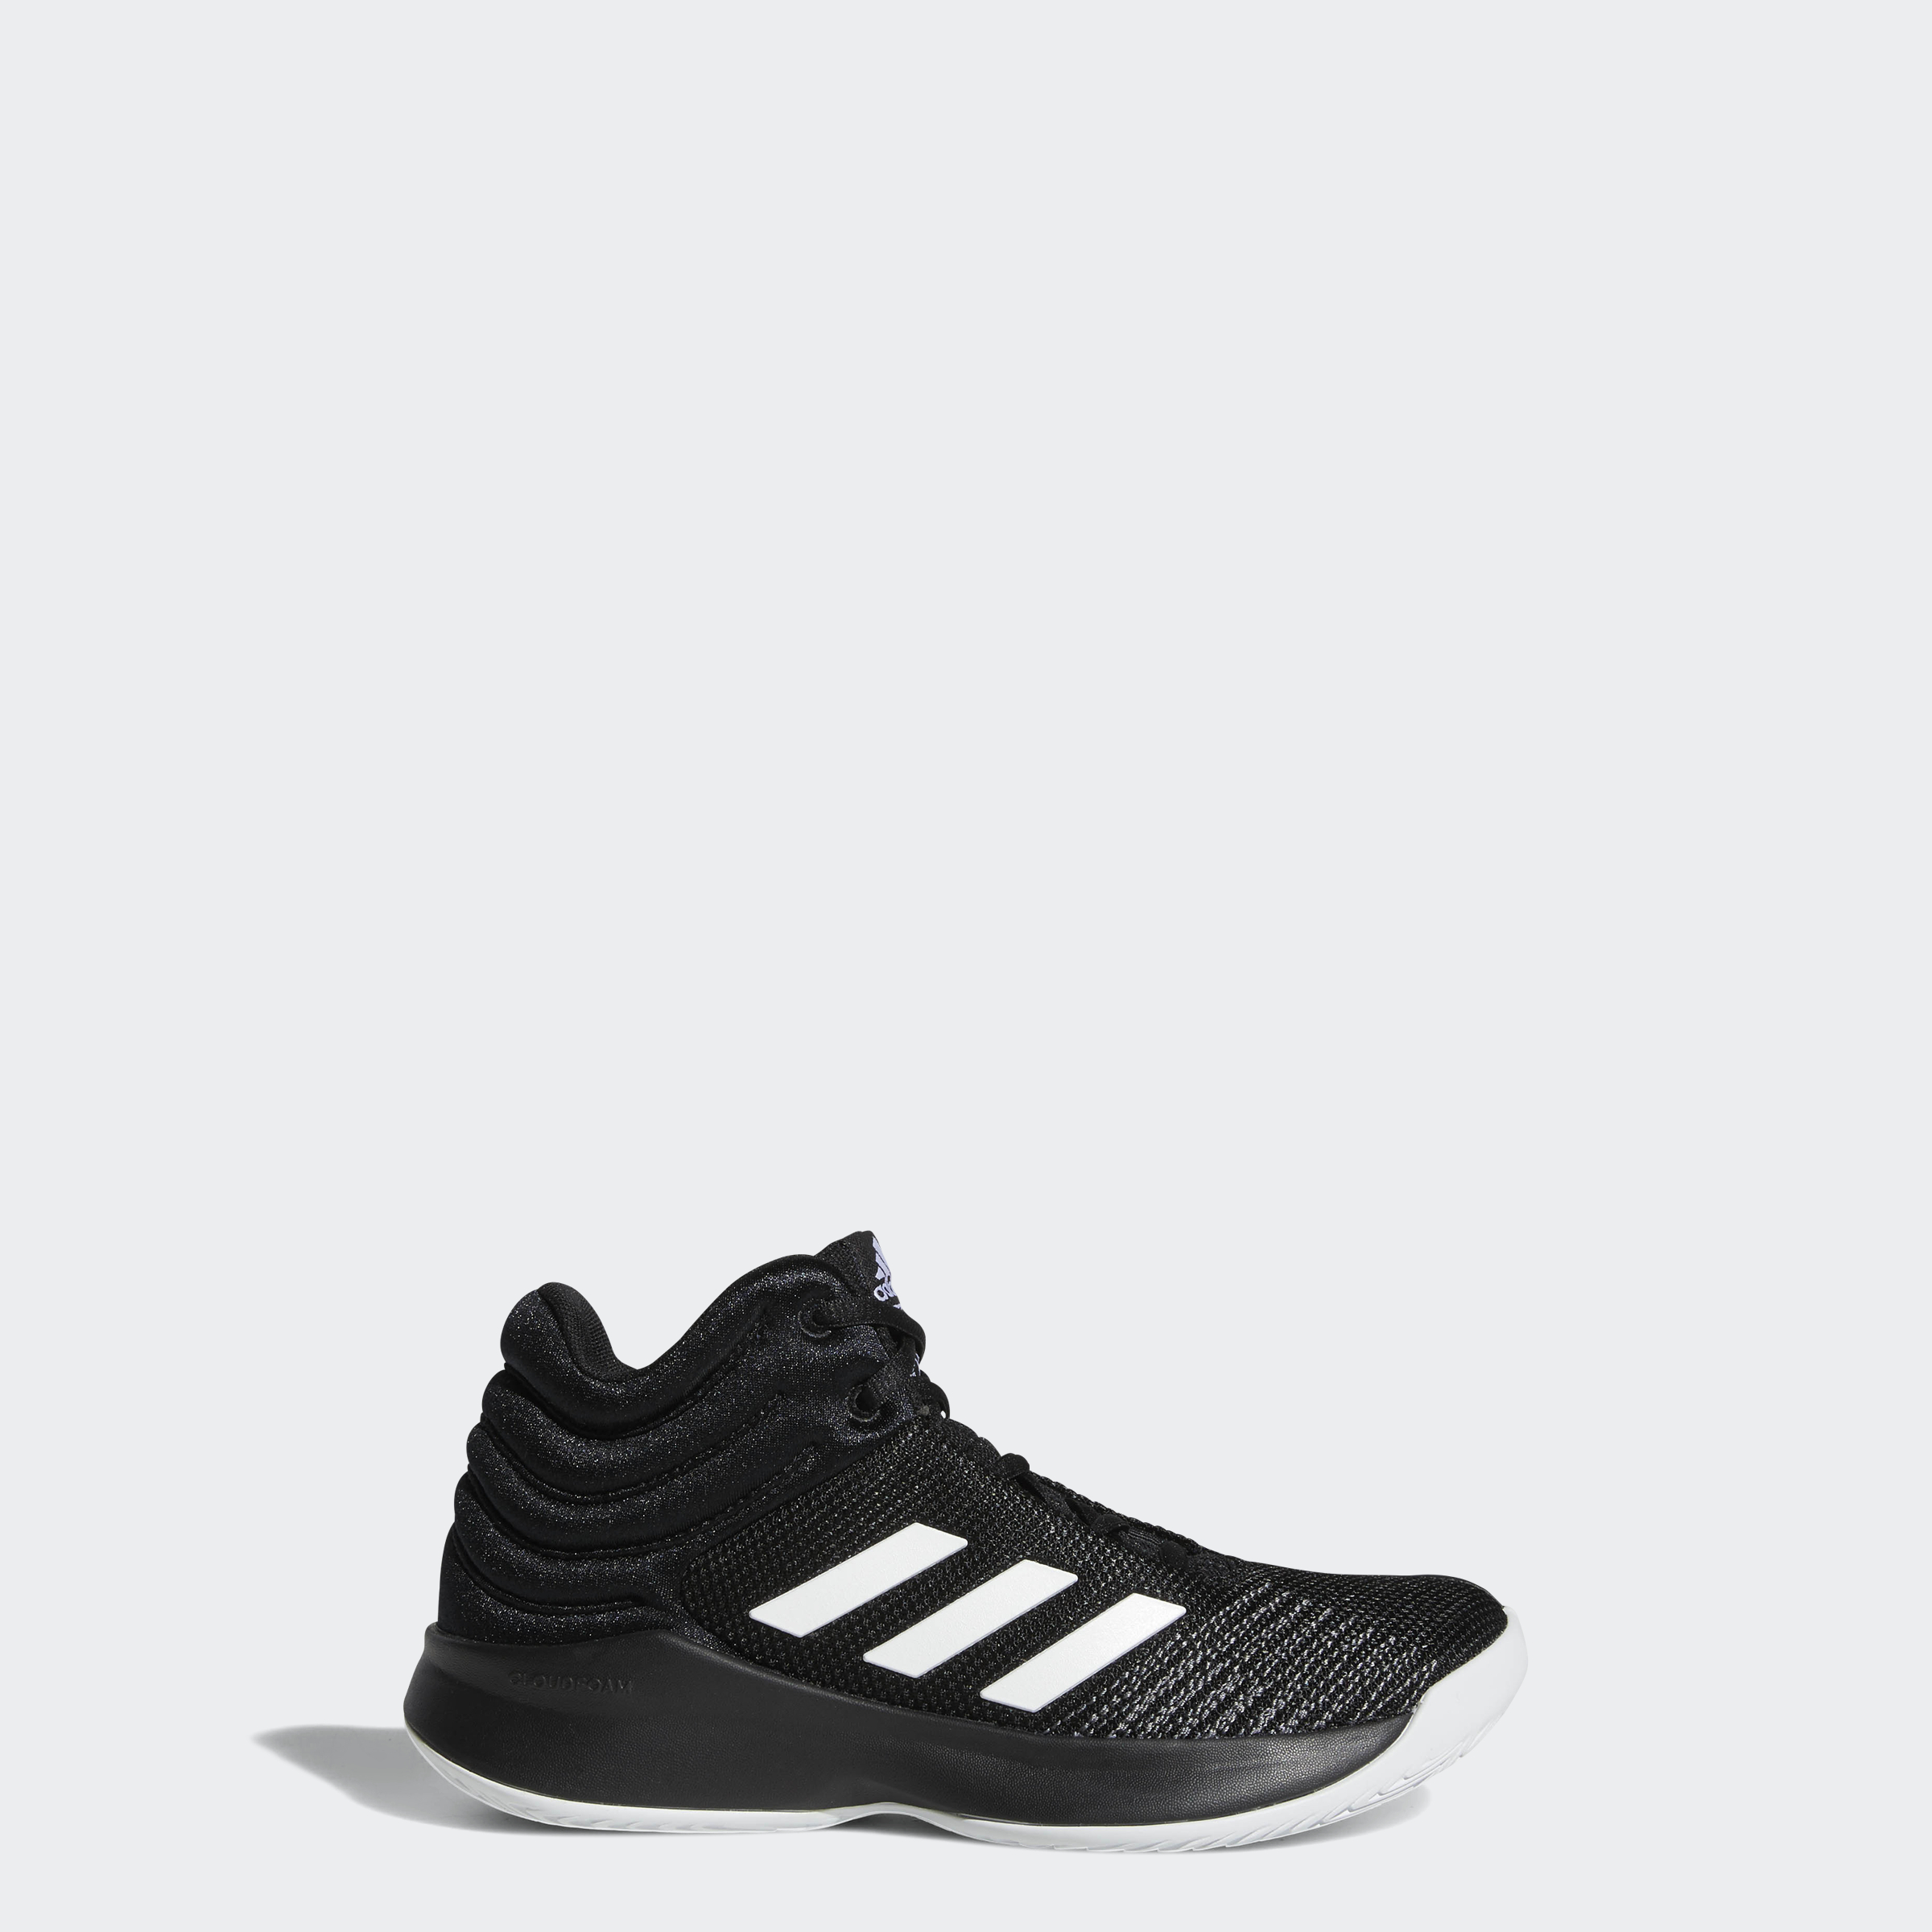 adidas-Pro-Spark-2018-Shoes-Kids-039 thumbnail 10